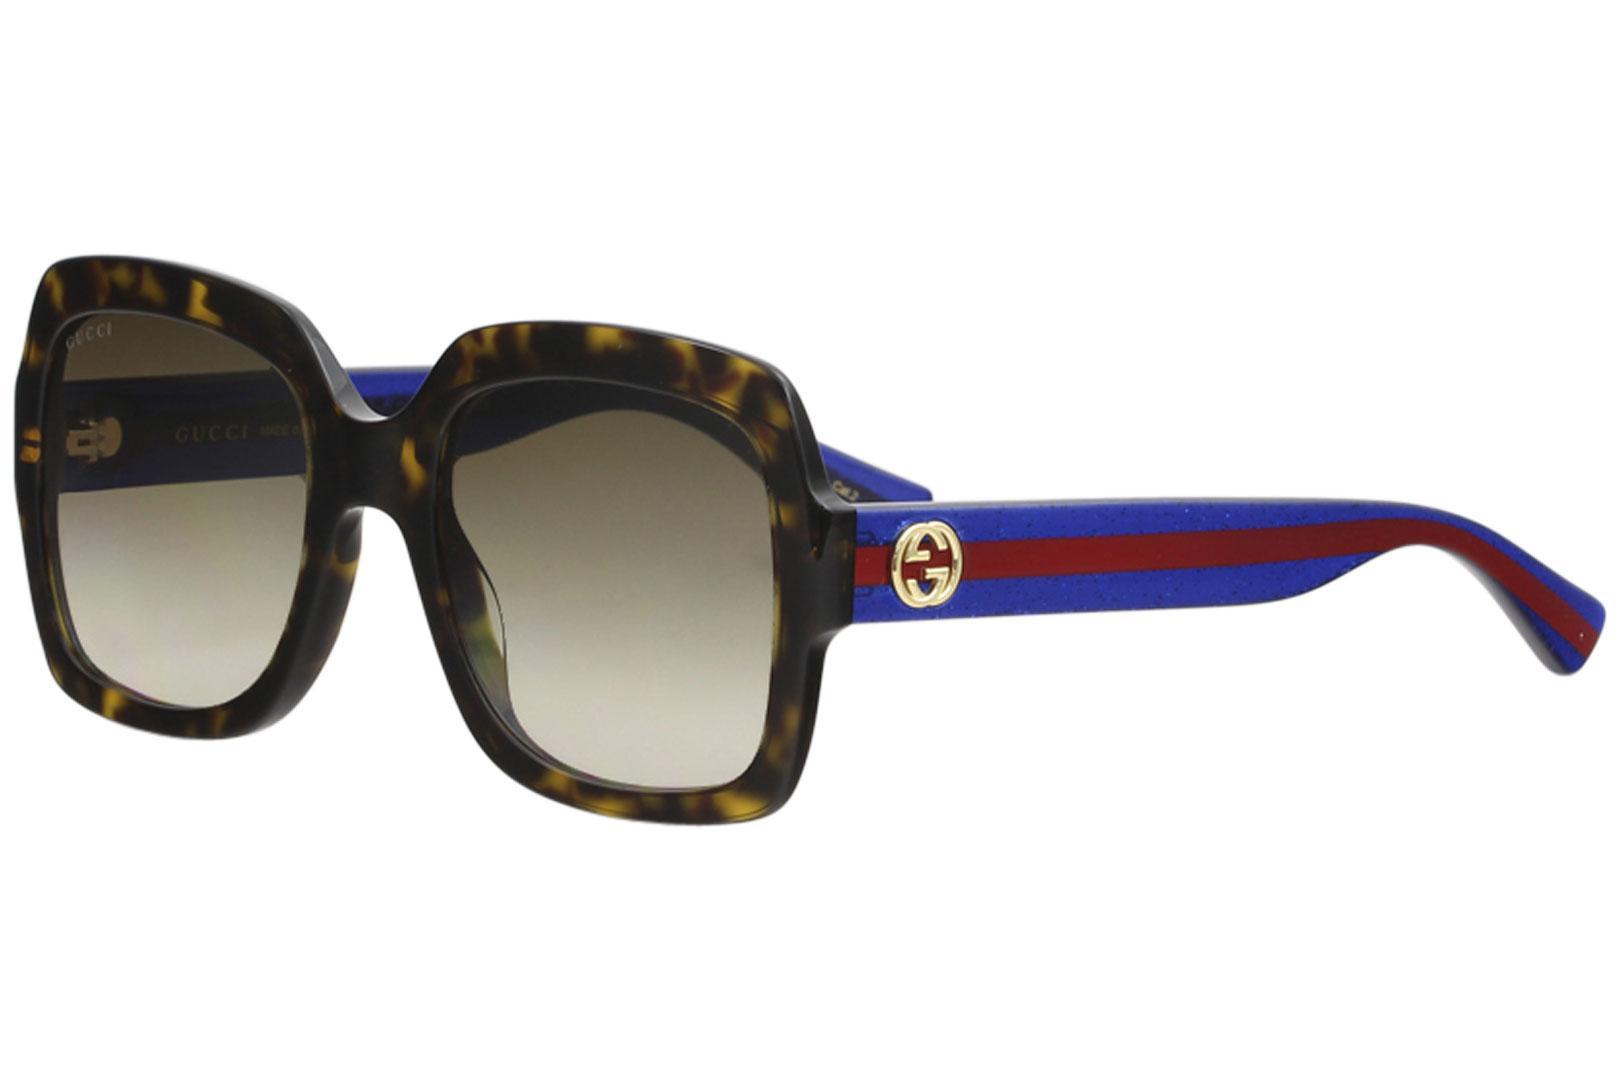 e1b03809b99ee Gucci Women s GG0036S GG 0036 S Fashion Sunglasses by Gucci